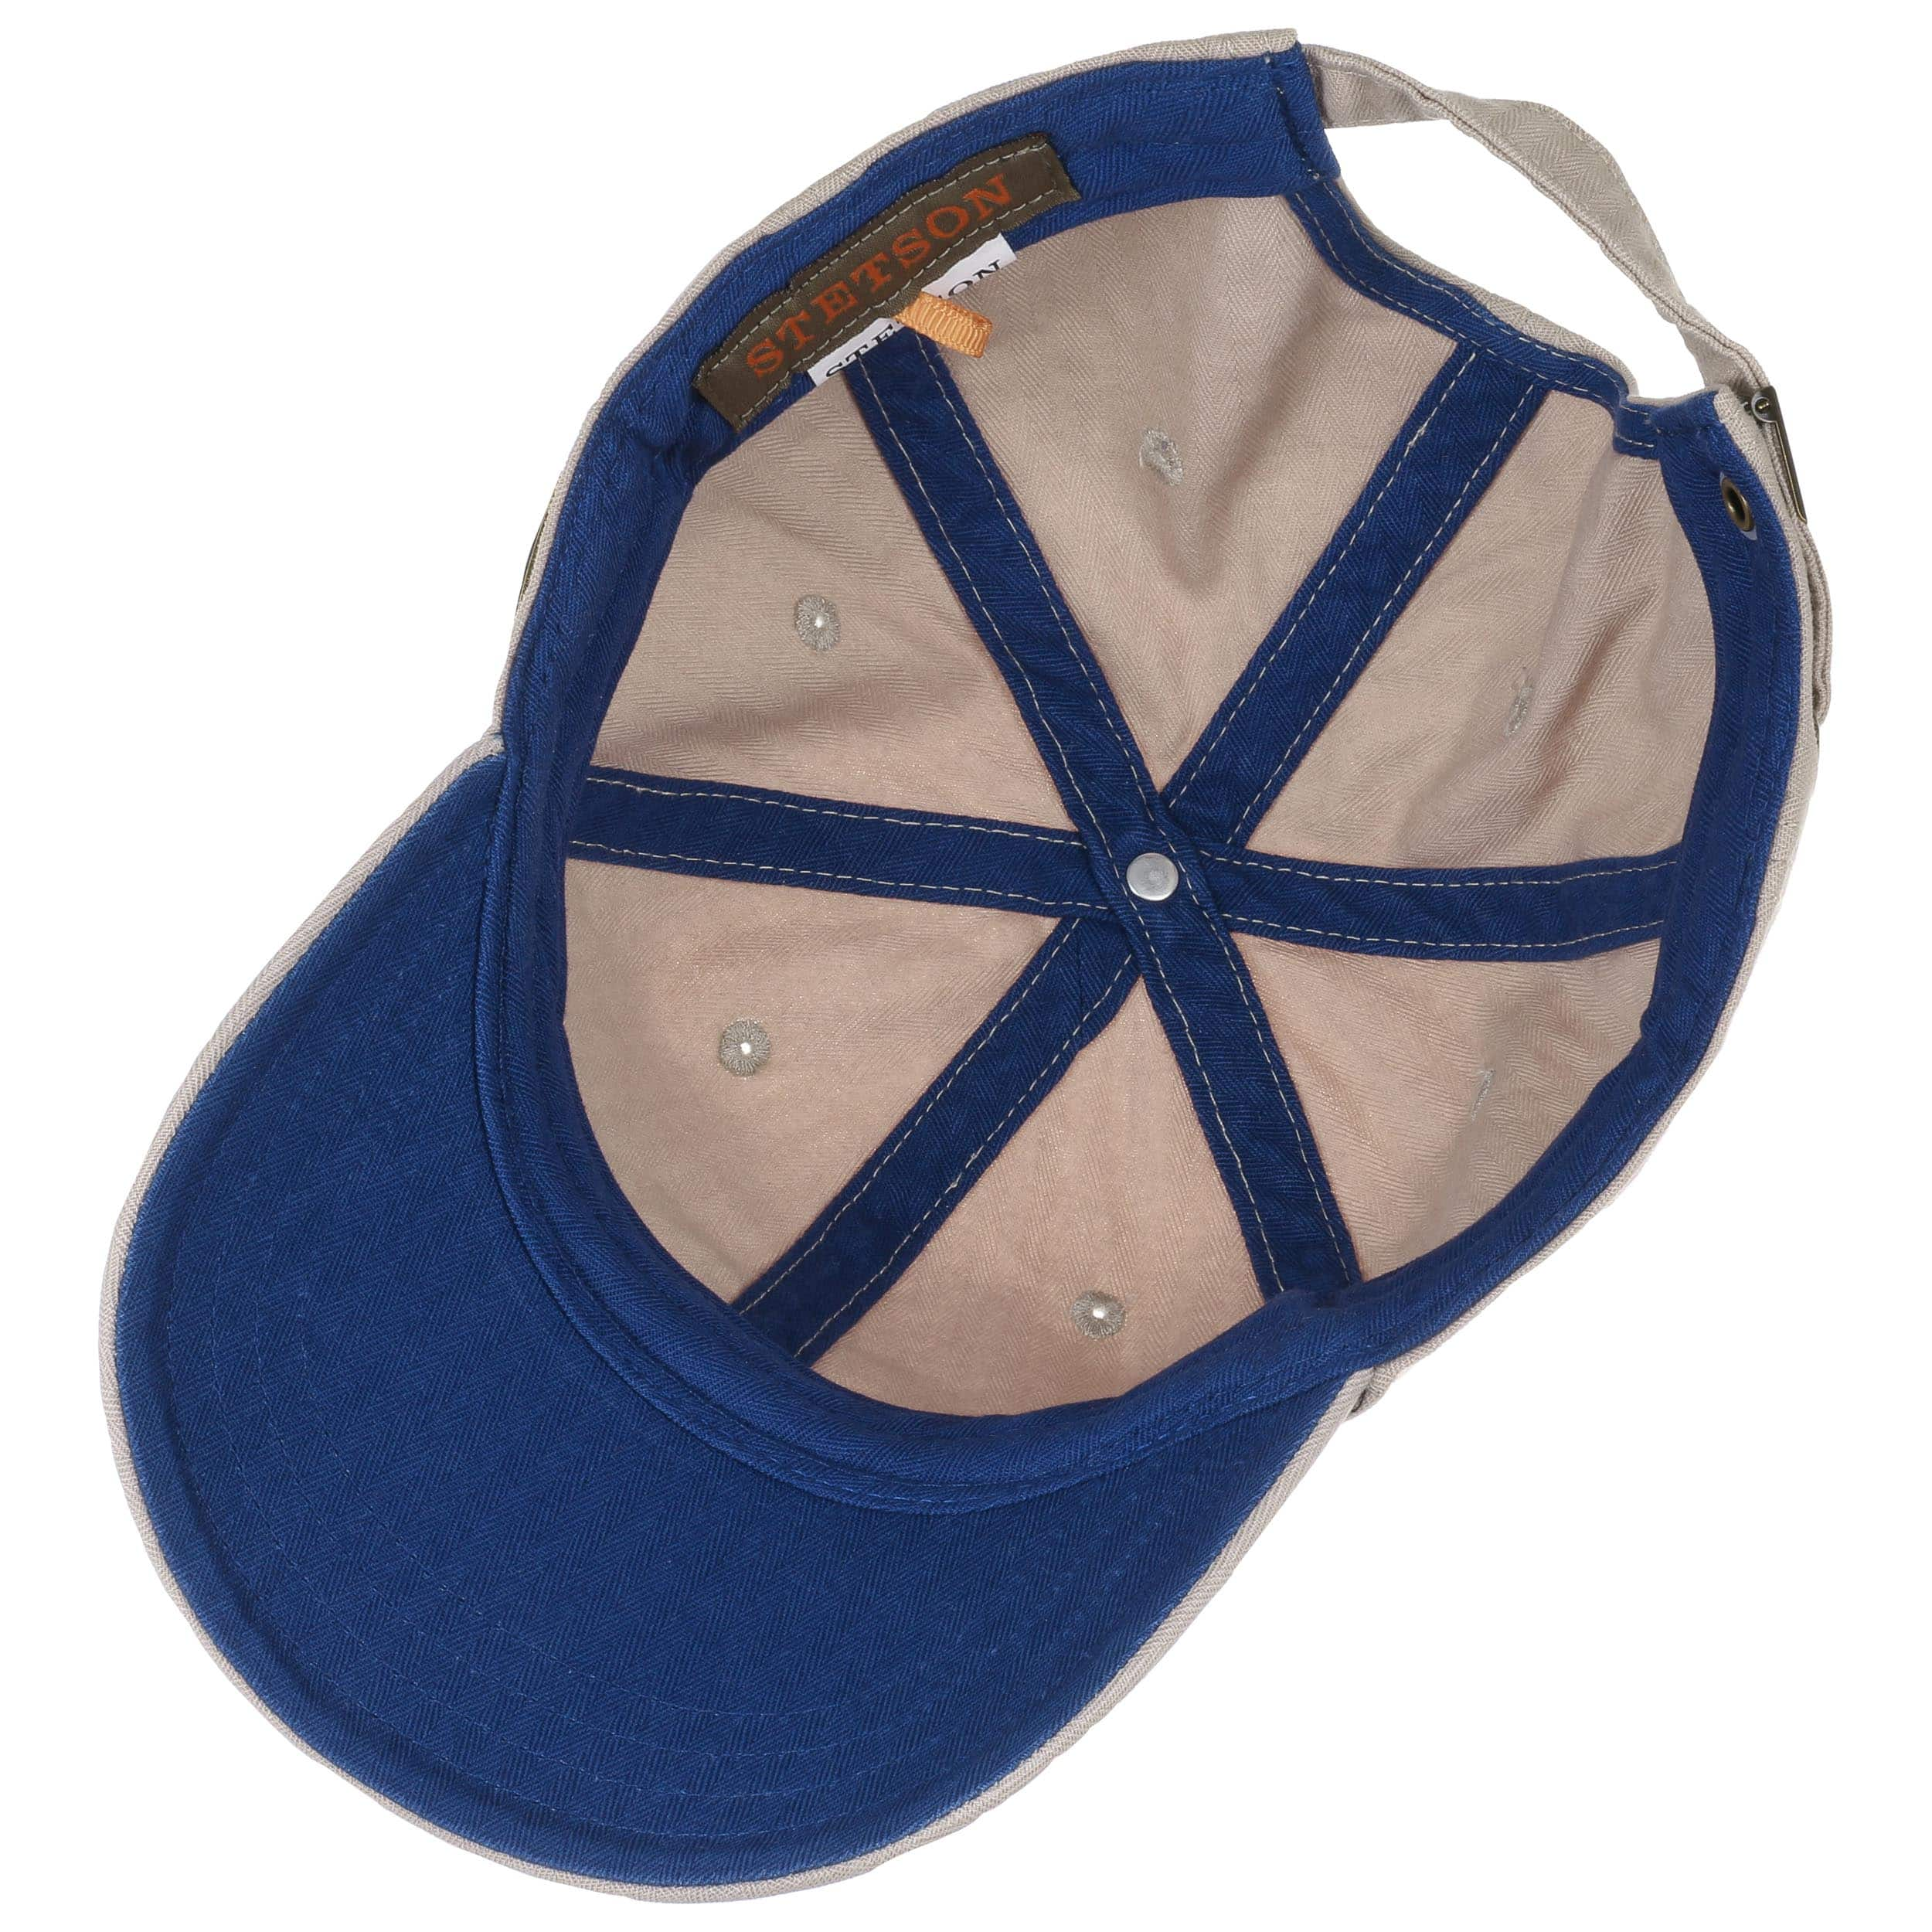 06086376014 ... Marshal Cotton Baseball Cap by Stetson - beige-blue 2 ...